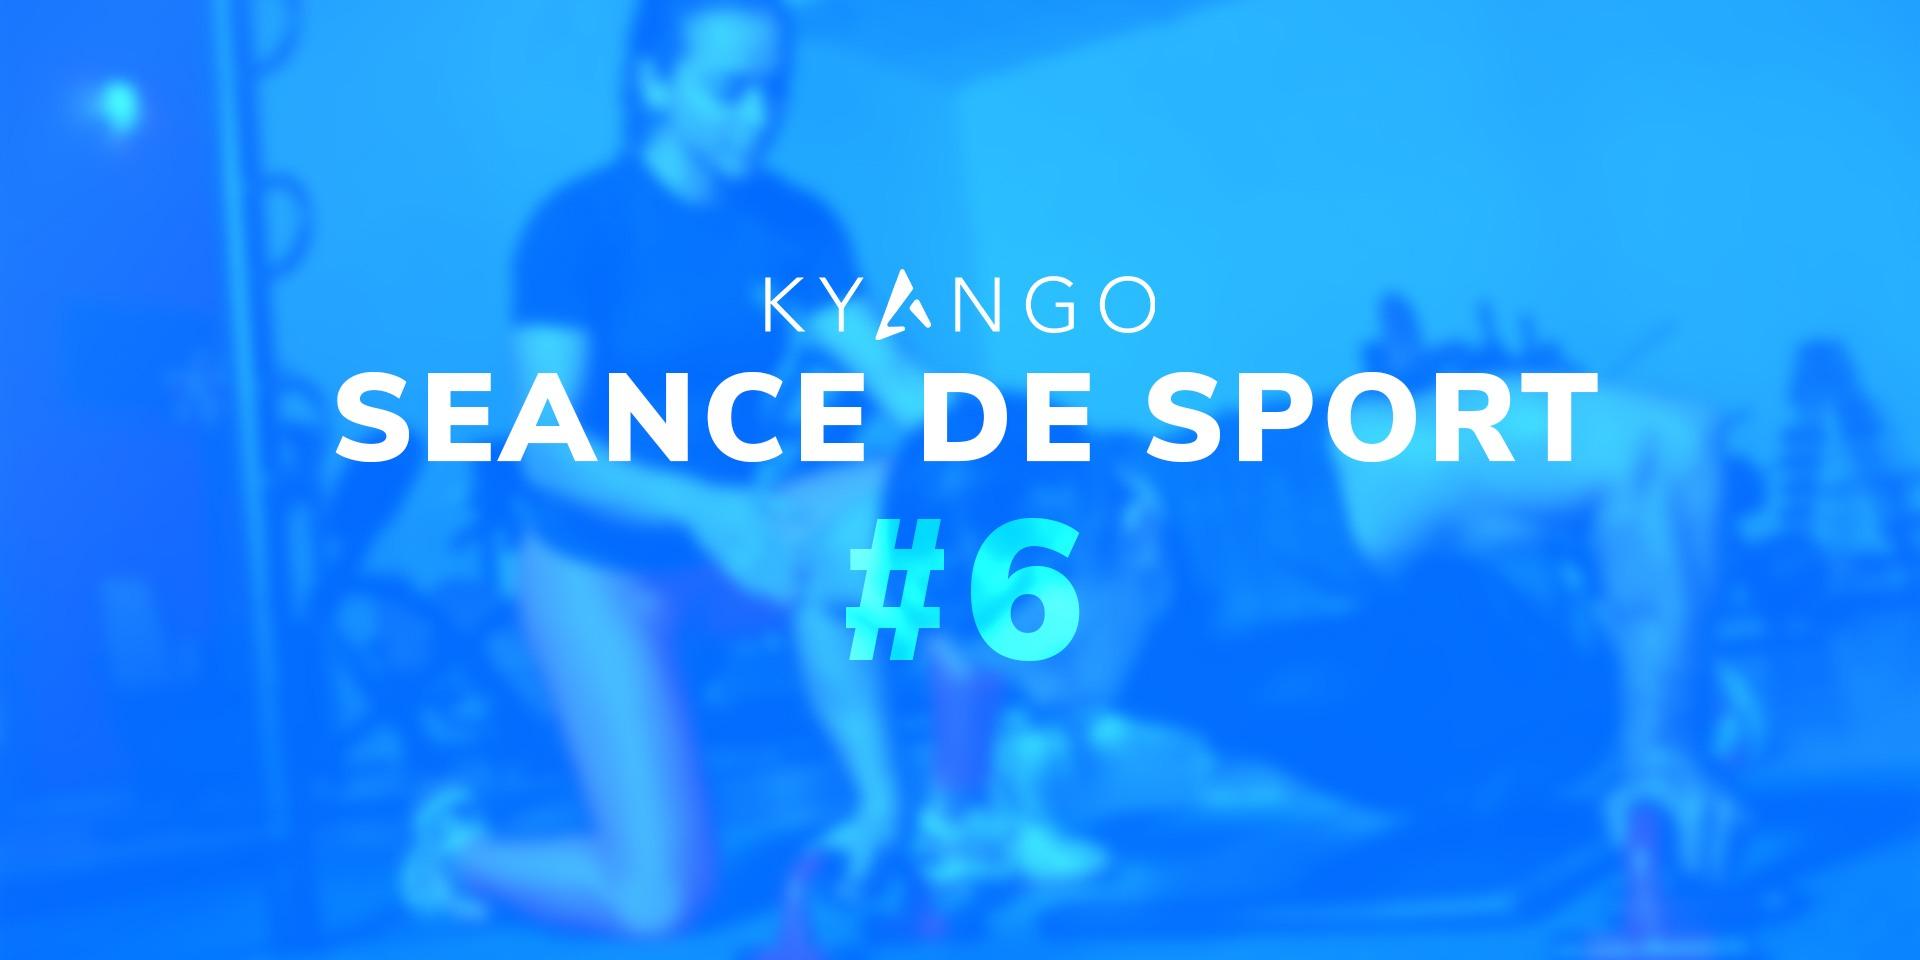 seance_de_sport_full-body